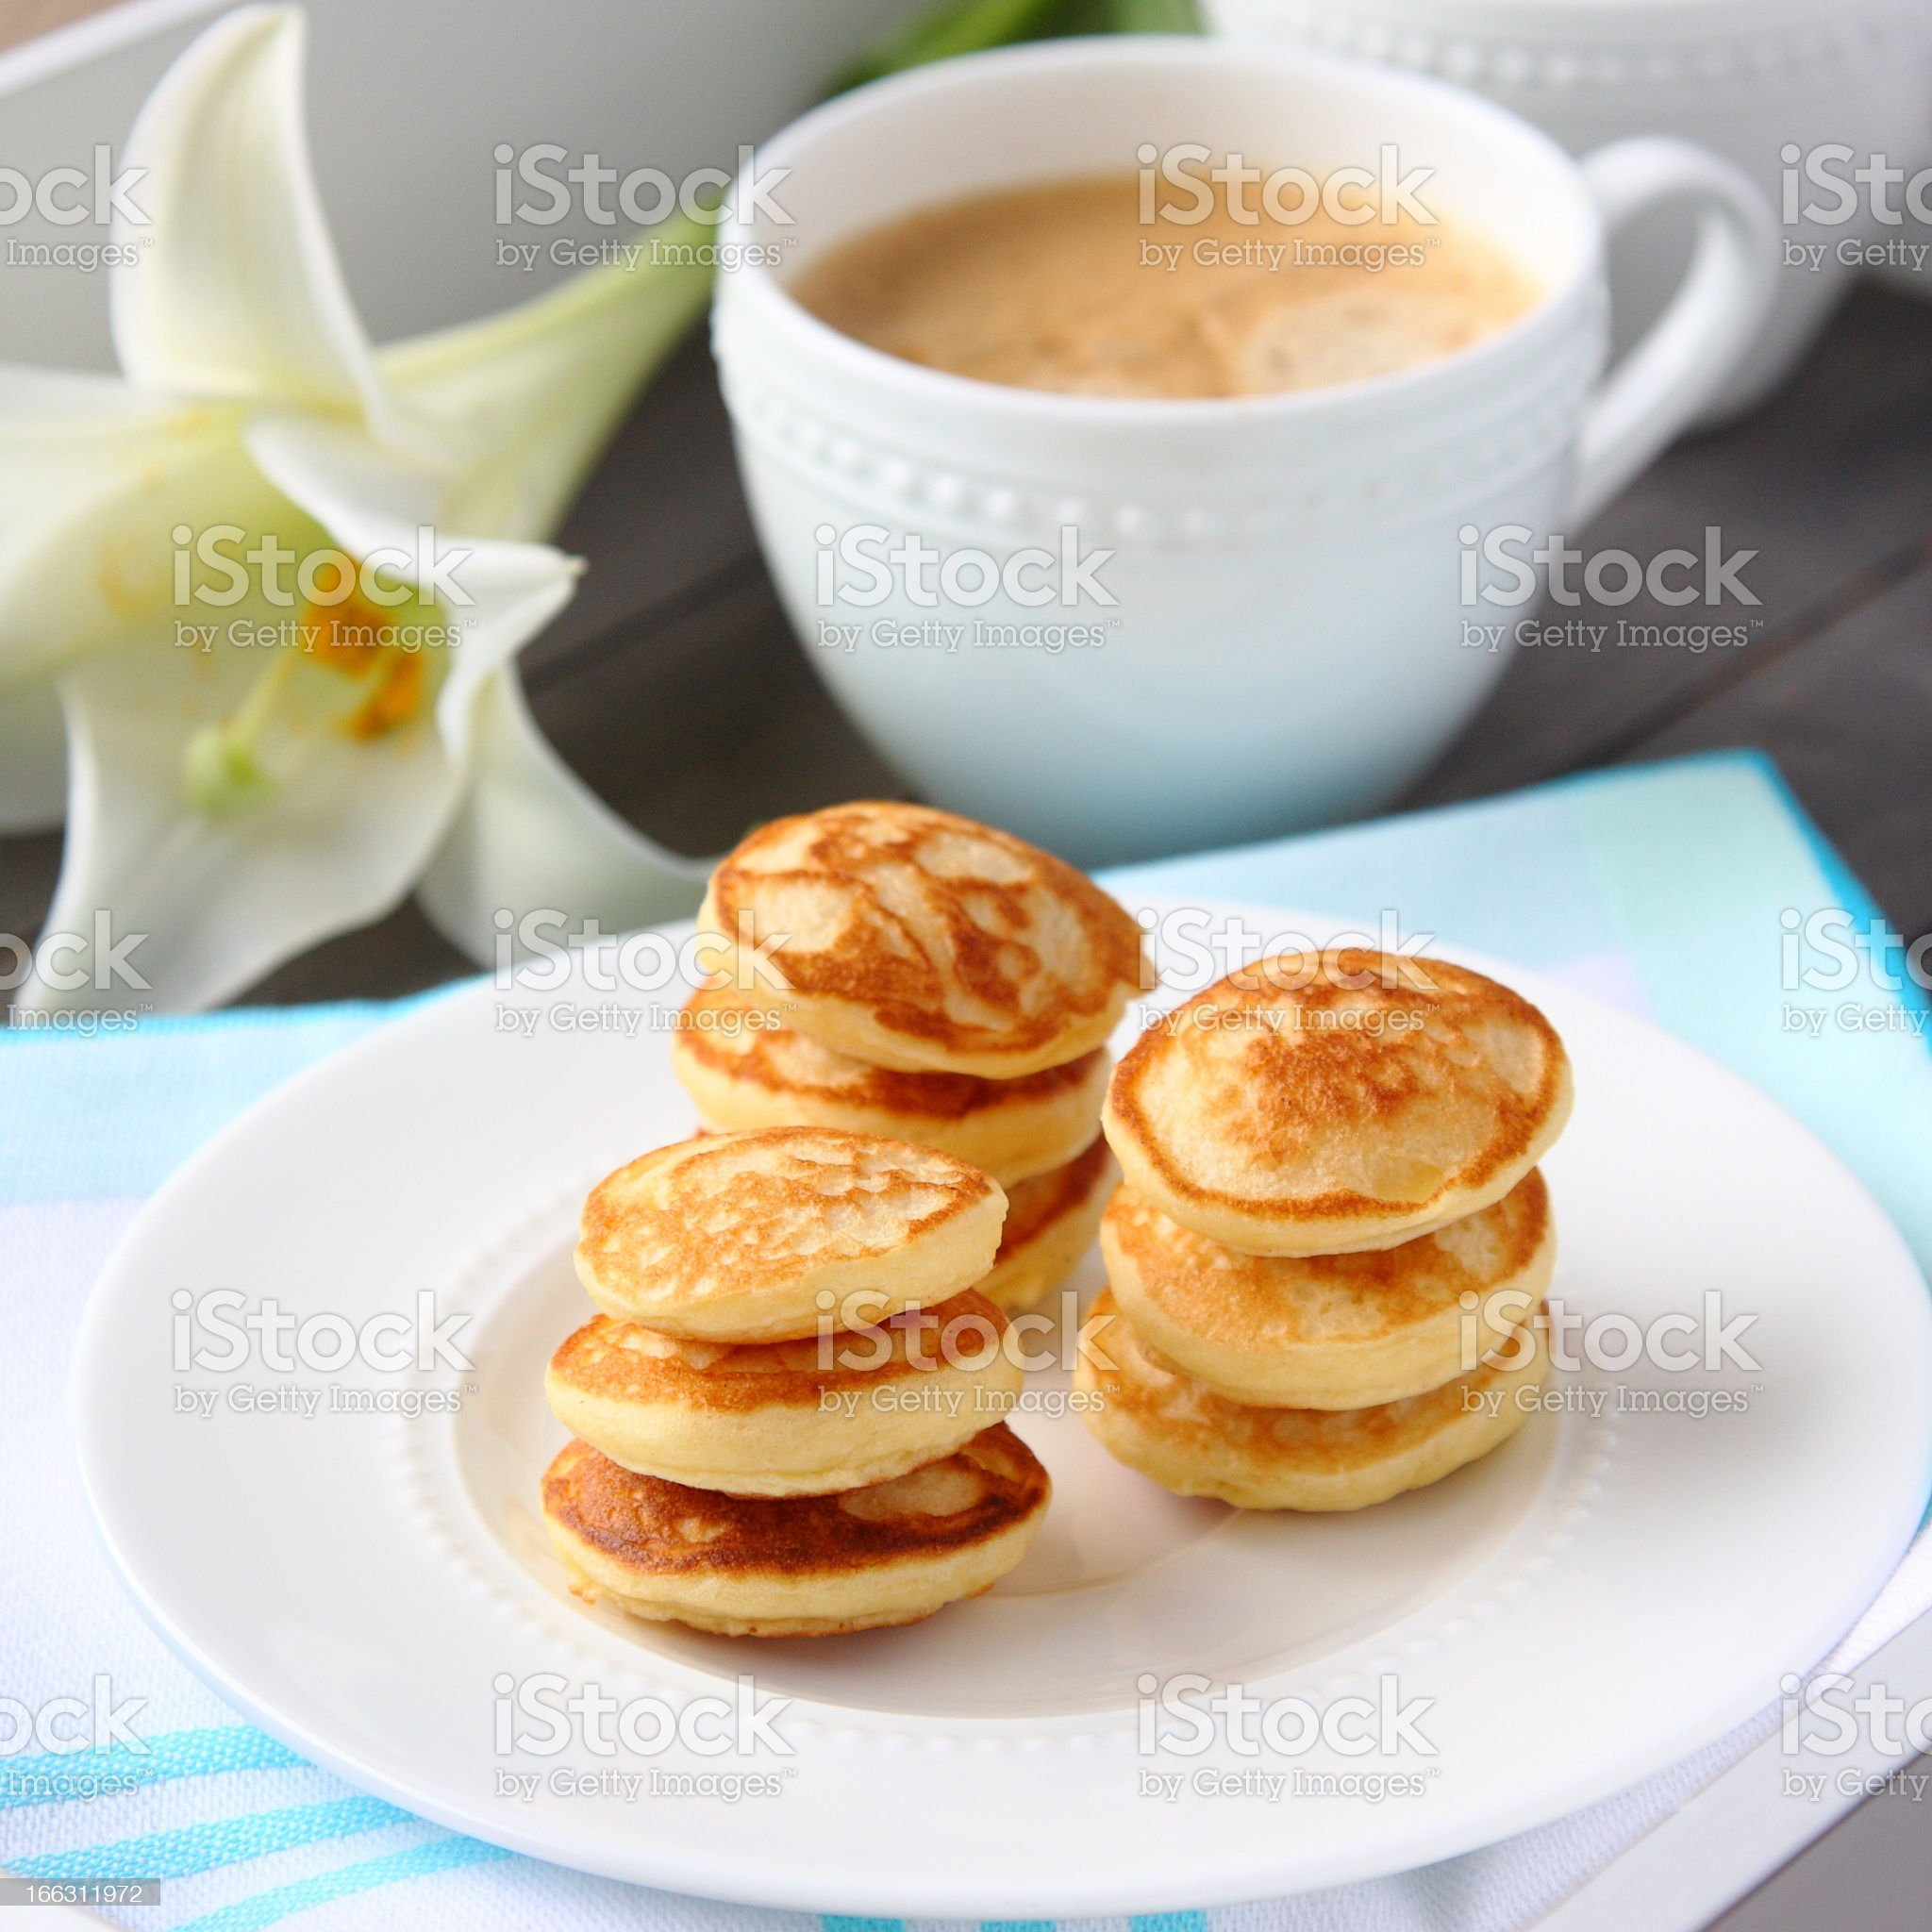 Freshly baked poffertjes - traditional Dutch little pancakes royalty-free stock photo